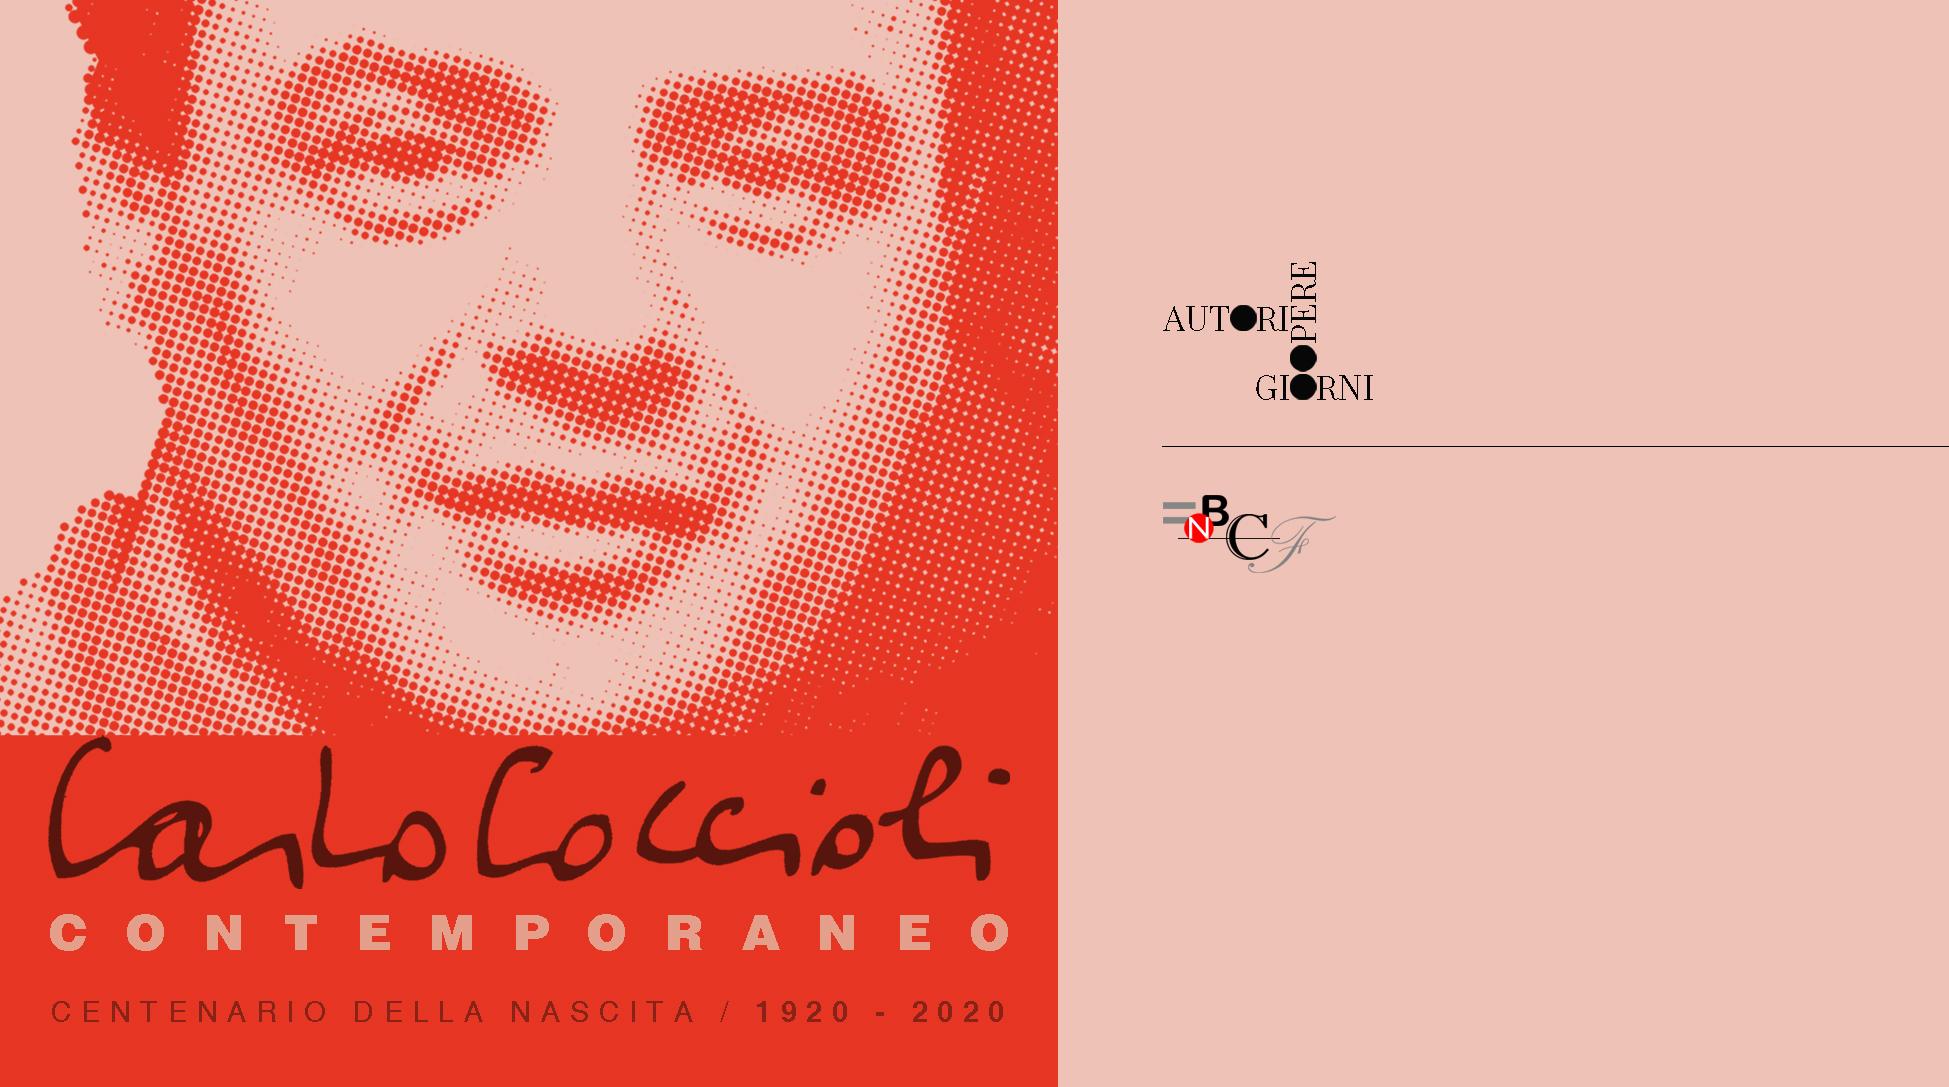 Carlo Coccioli Contemporaneo